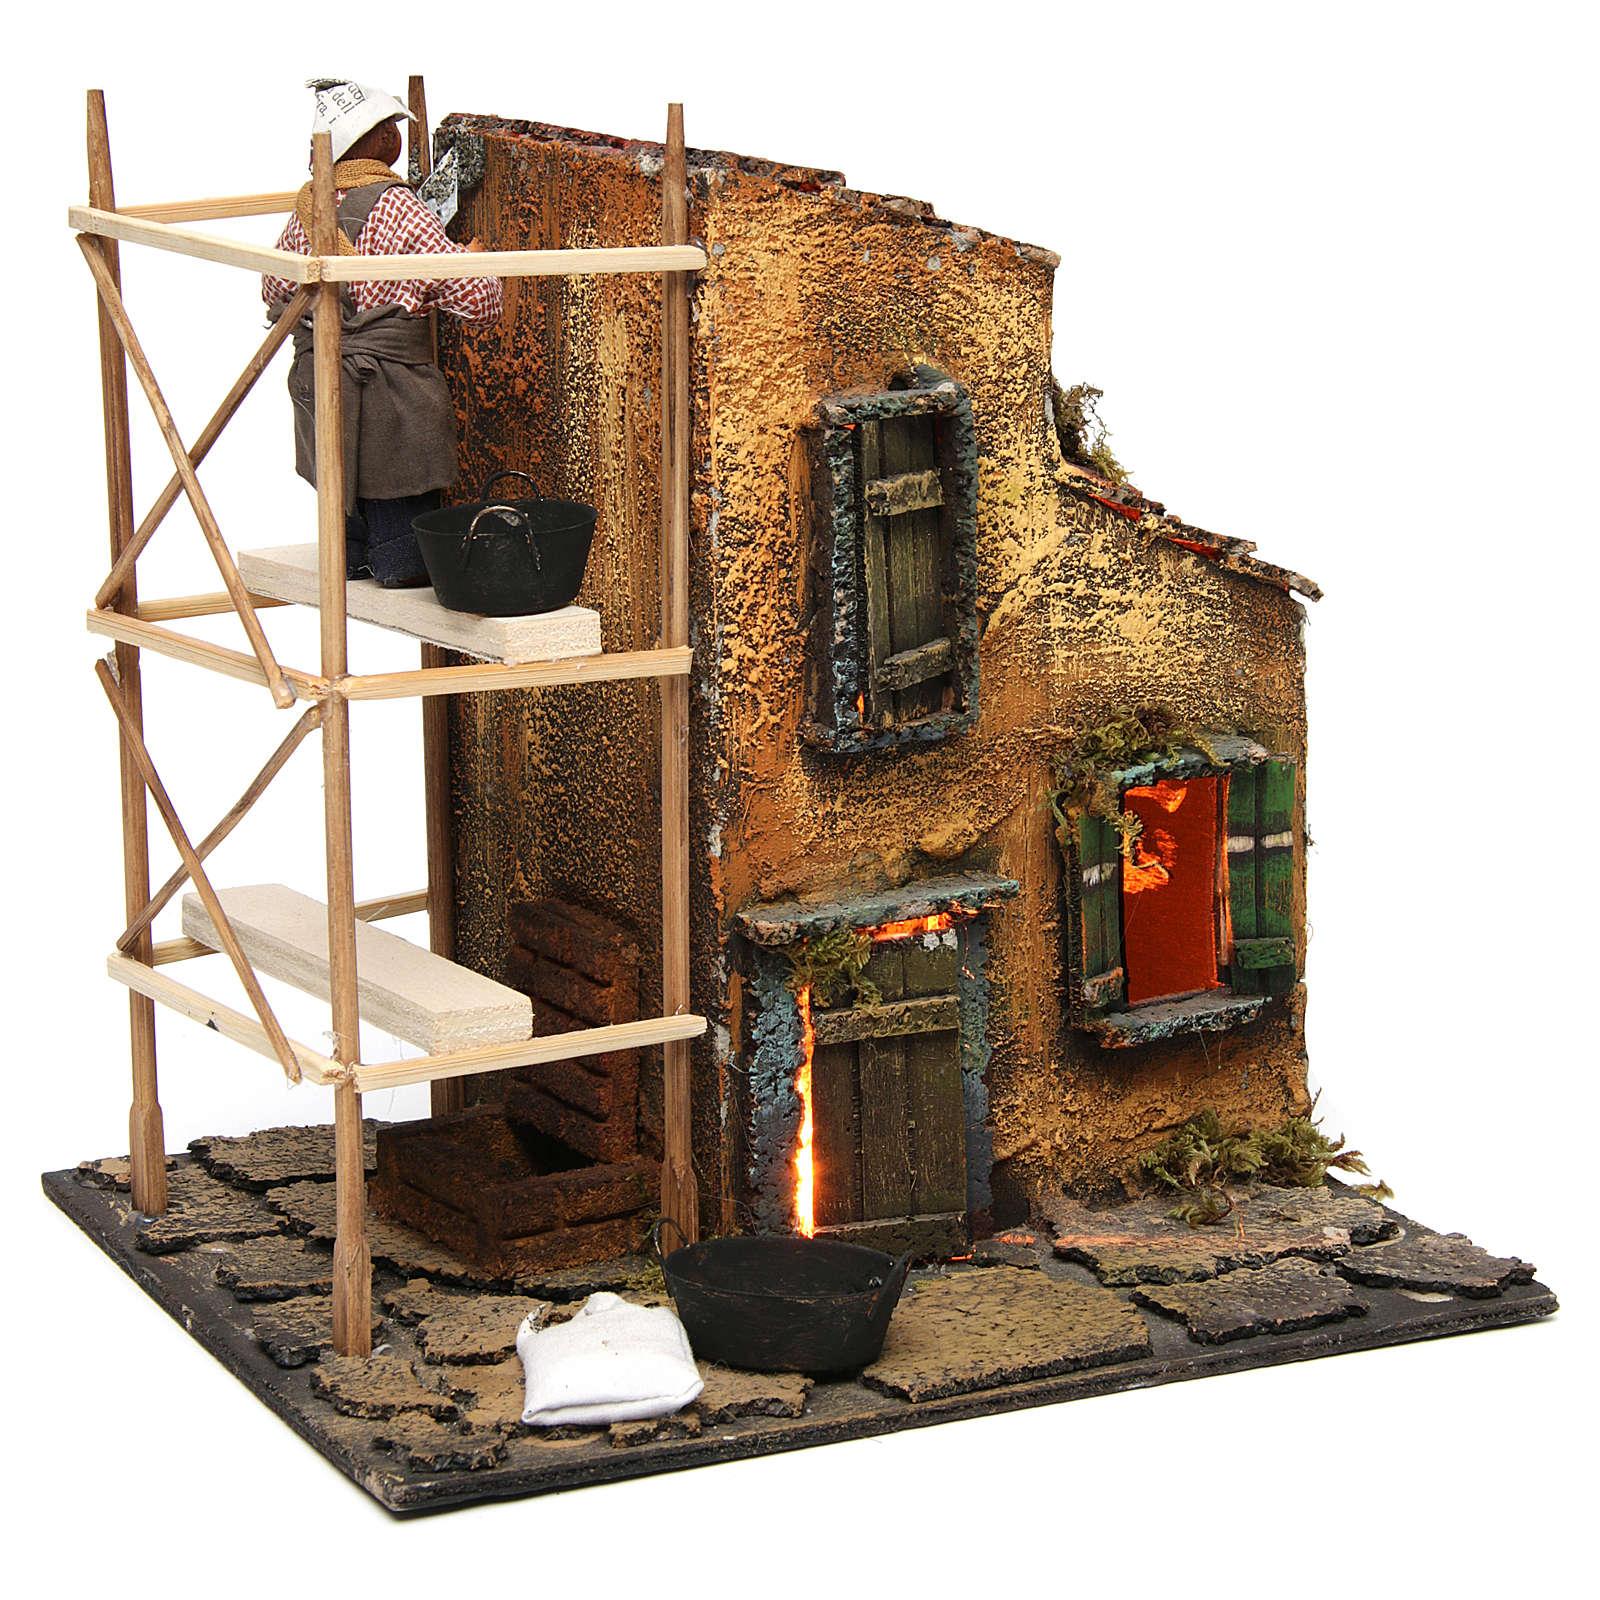 Builder animated Neapolitan Nativity figurine 10 cm 4